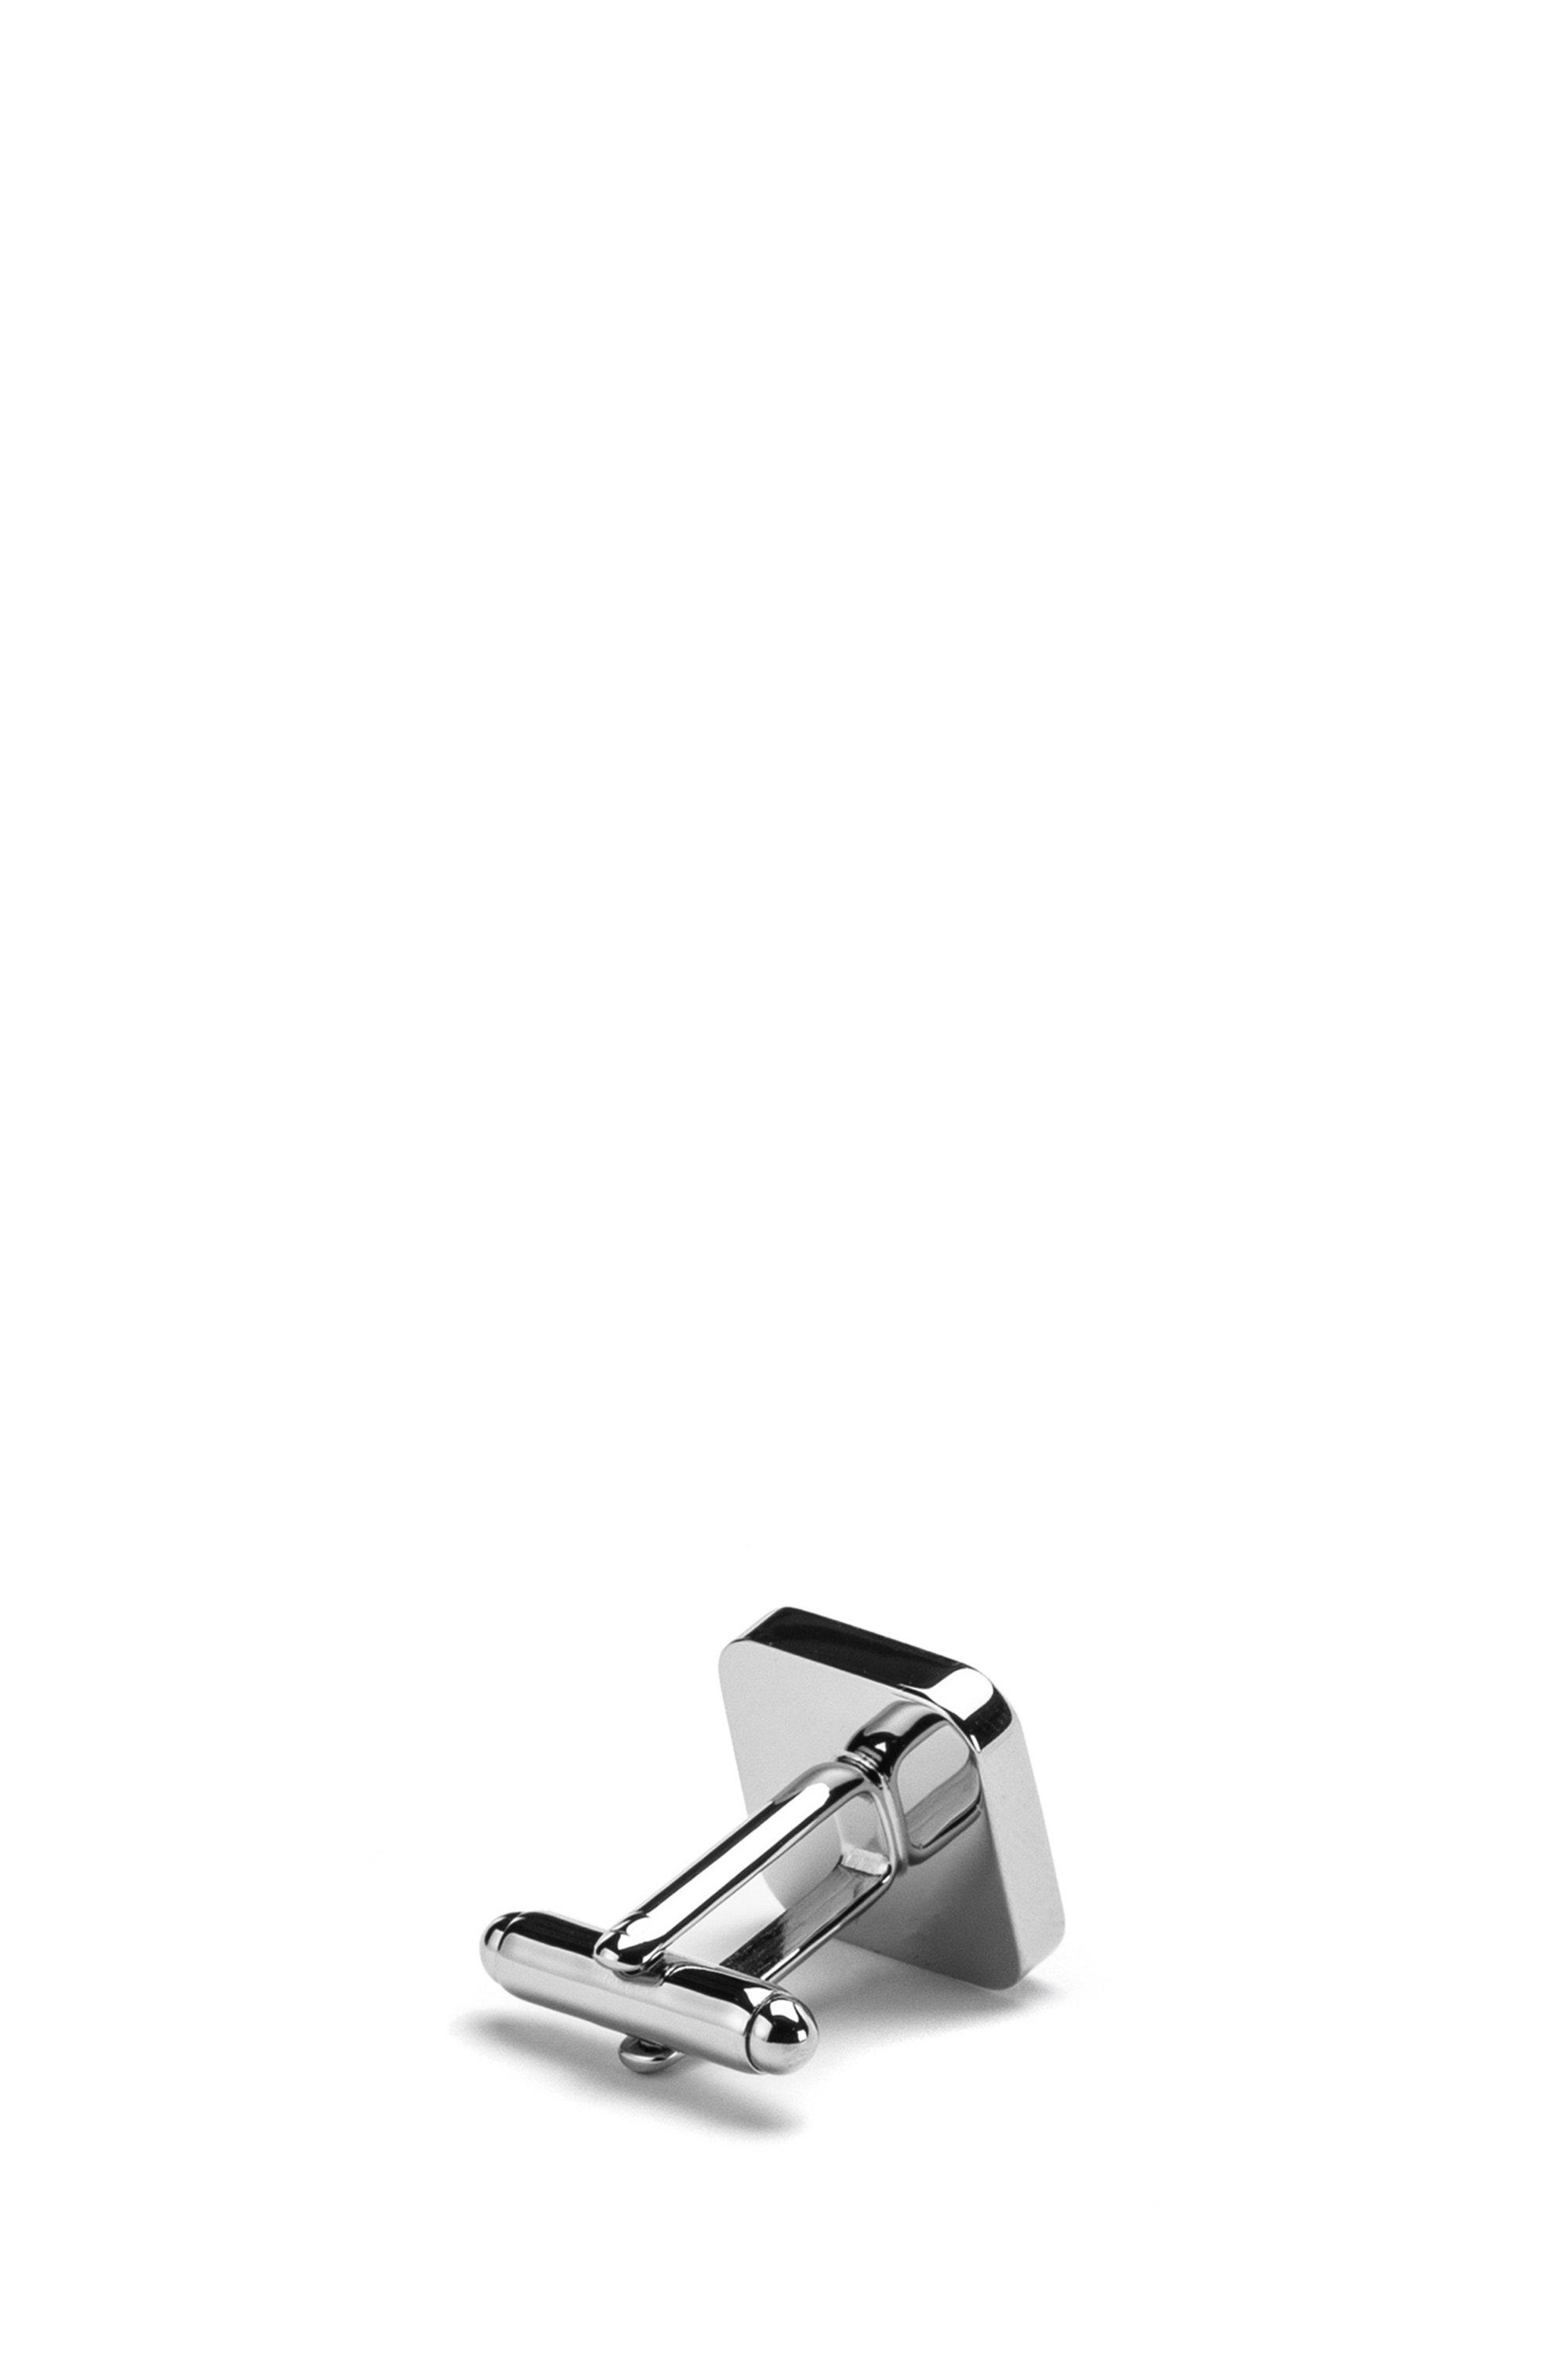 Square brass cufflinks with logo enamel core